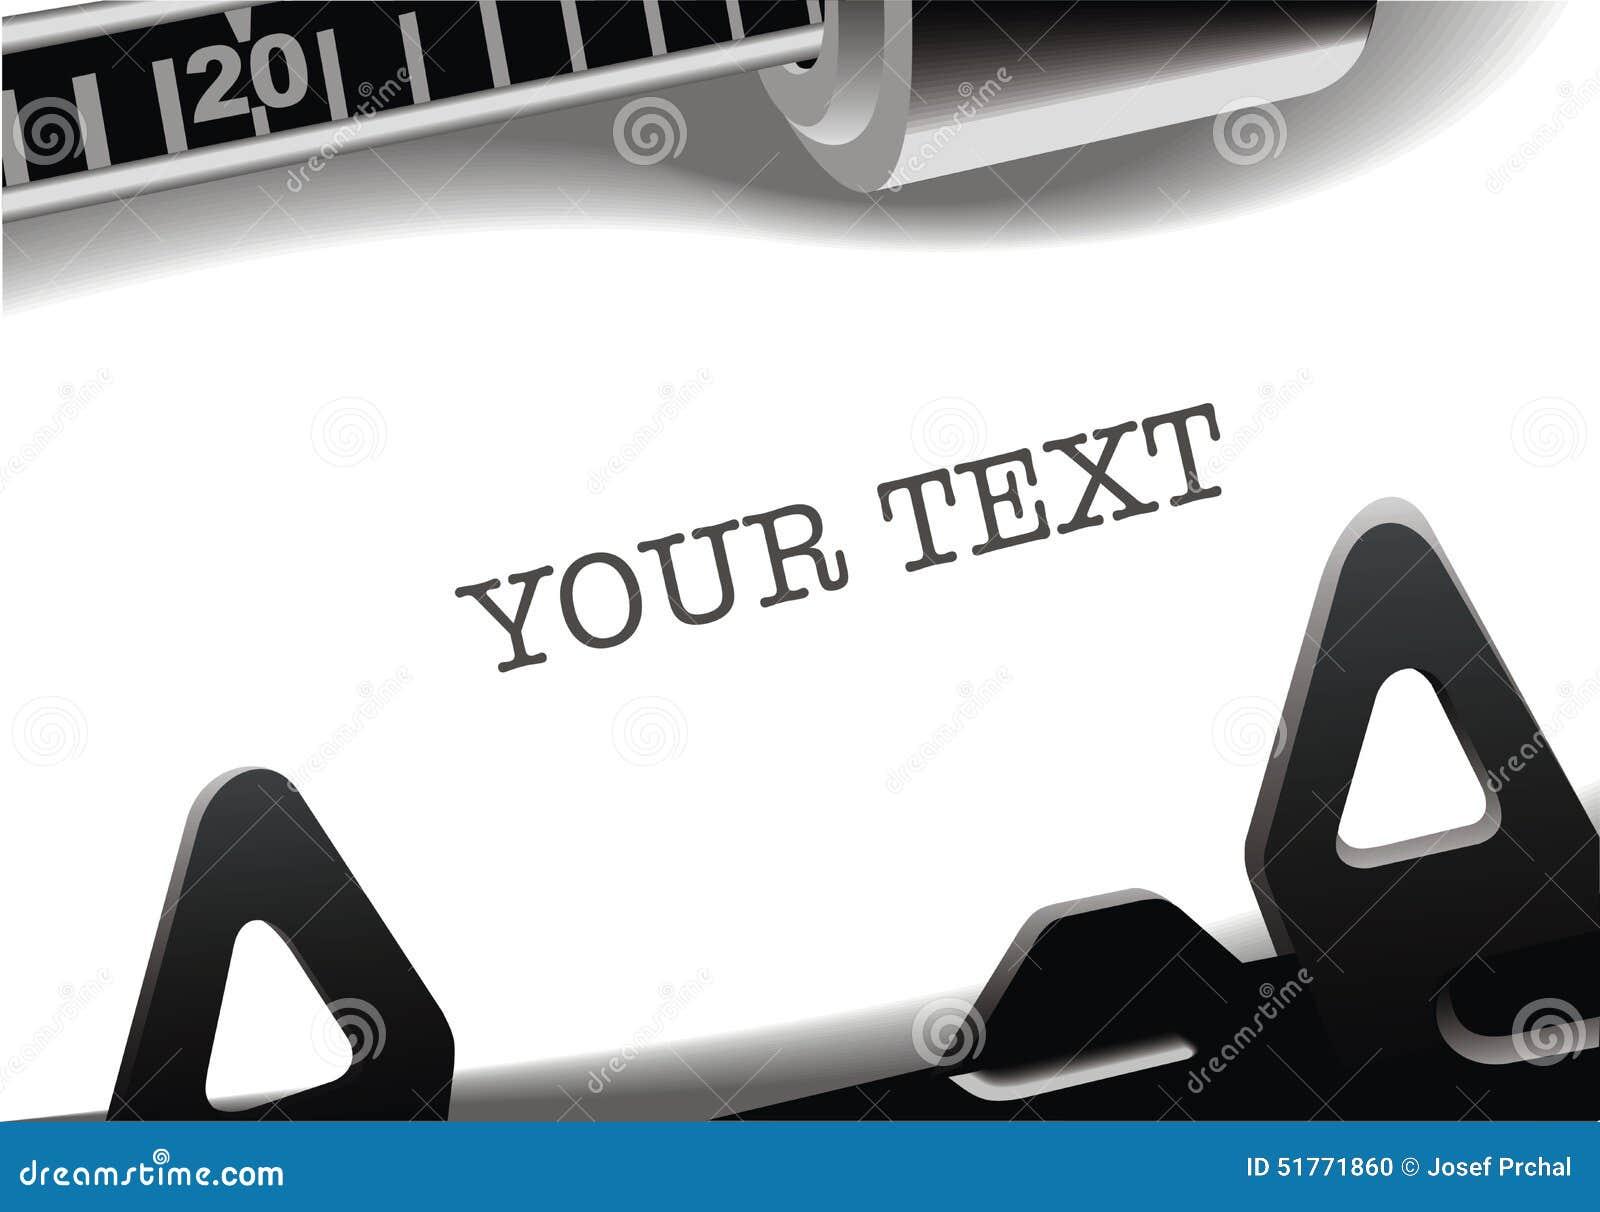 Typewriter background